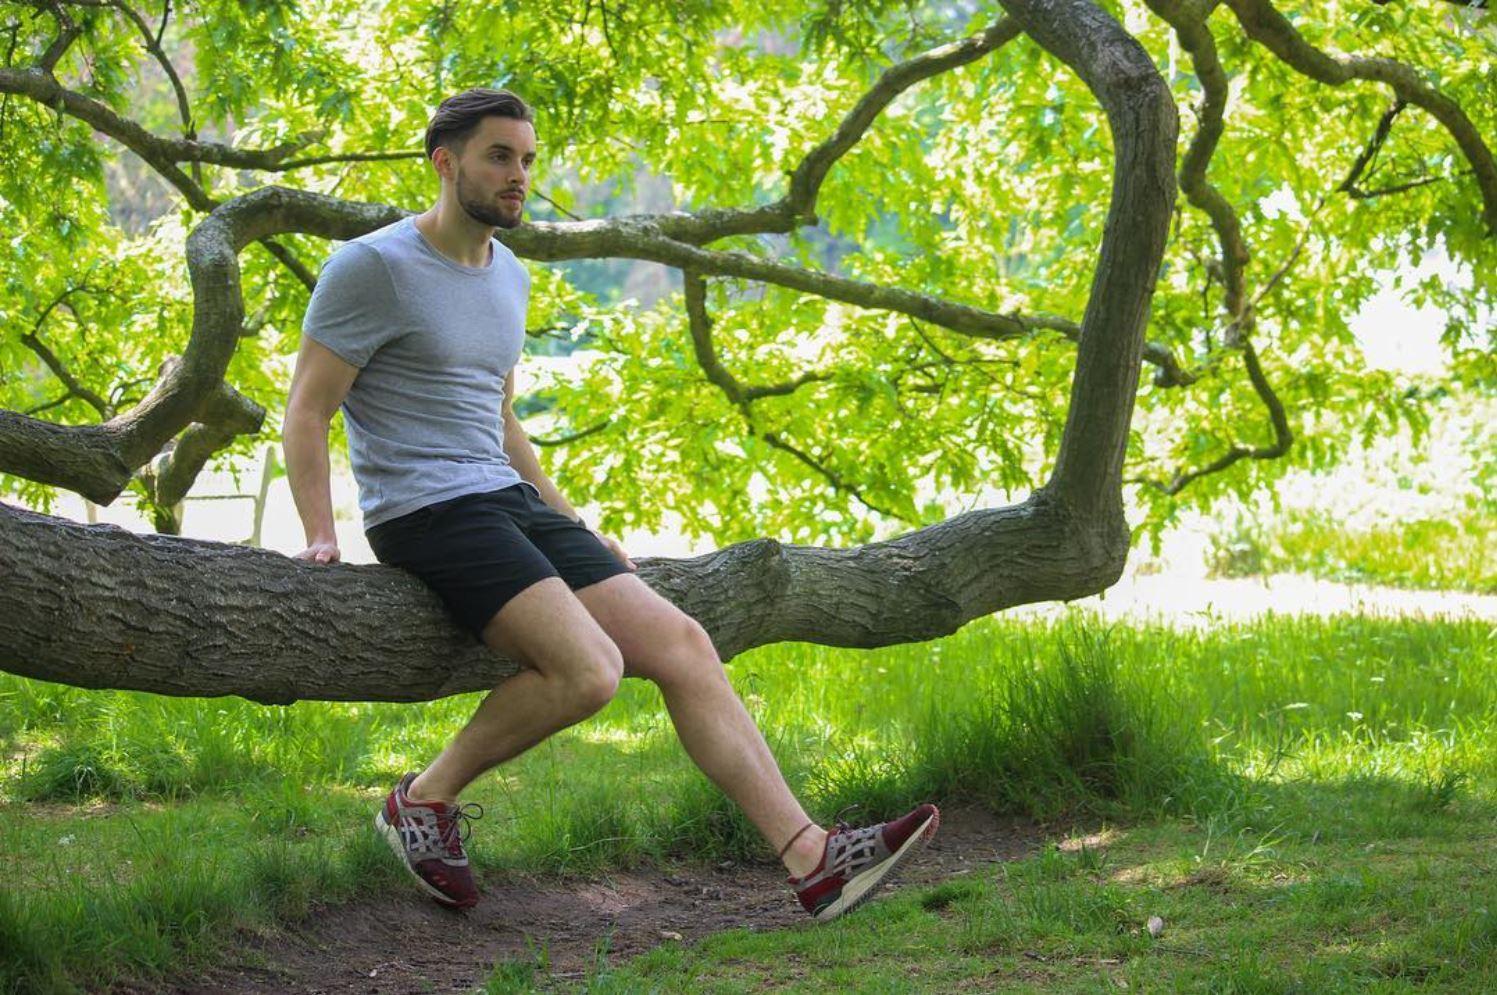 Jon sitting on a large branch